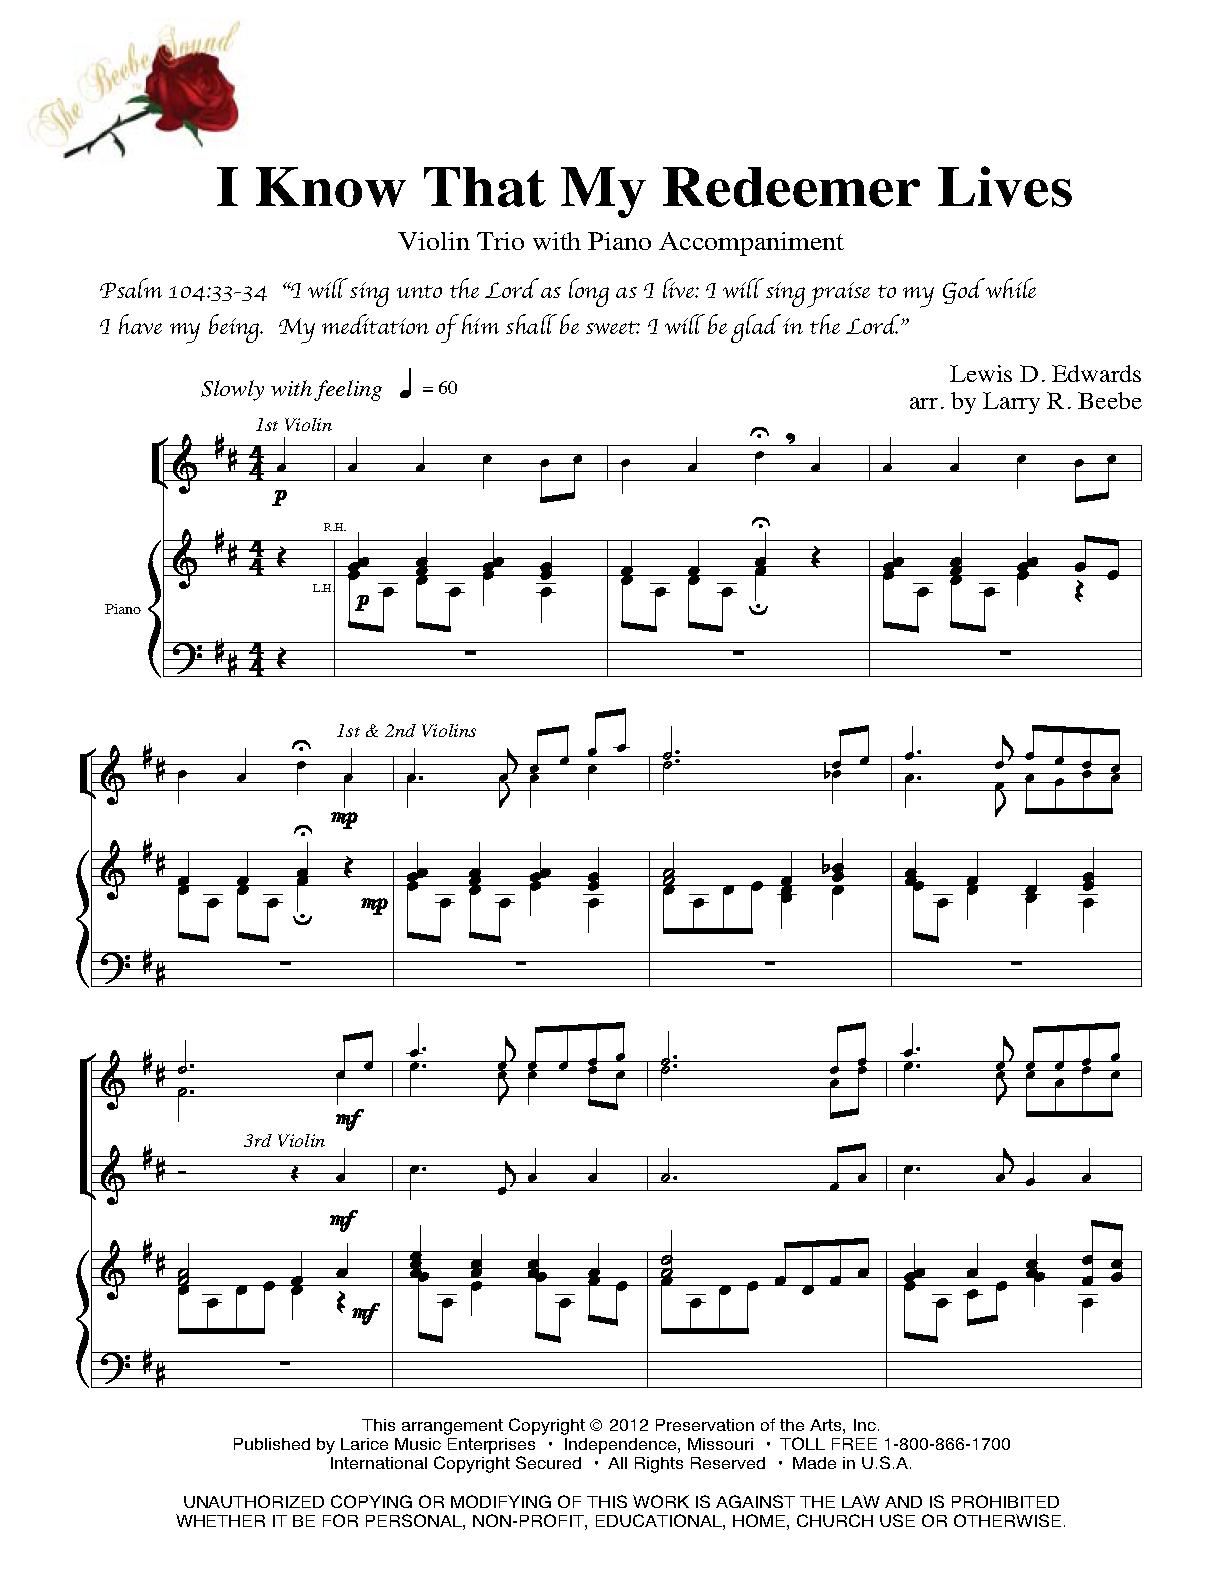 I know my redeemer lives instrumental downloads